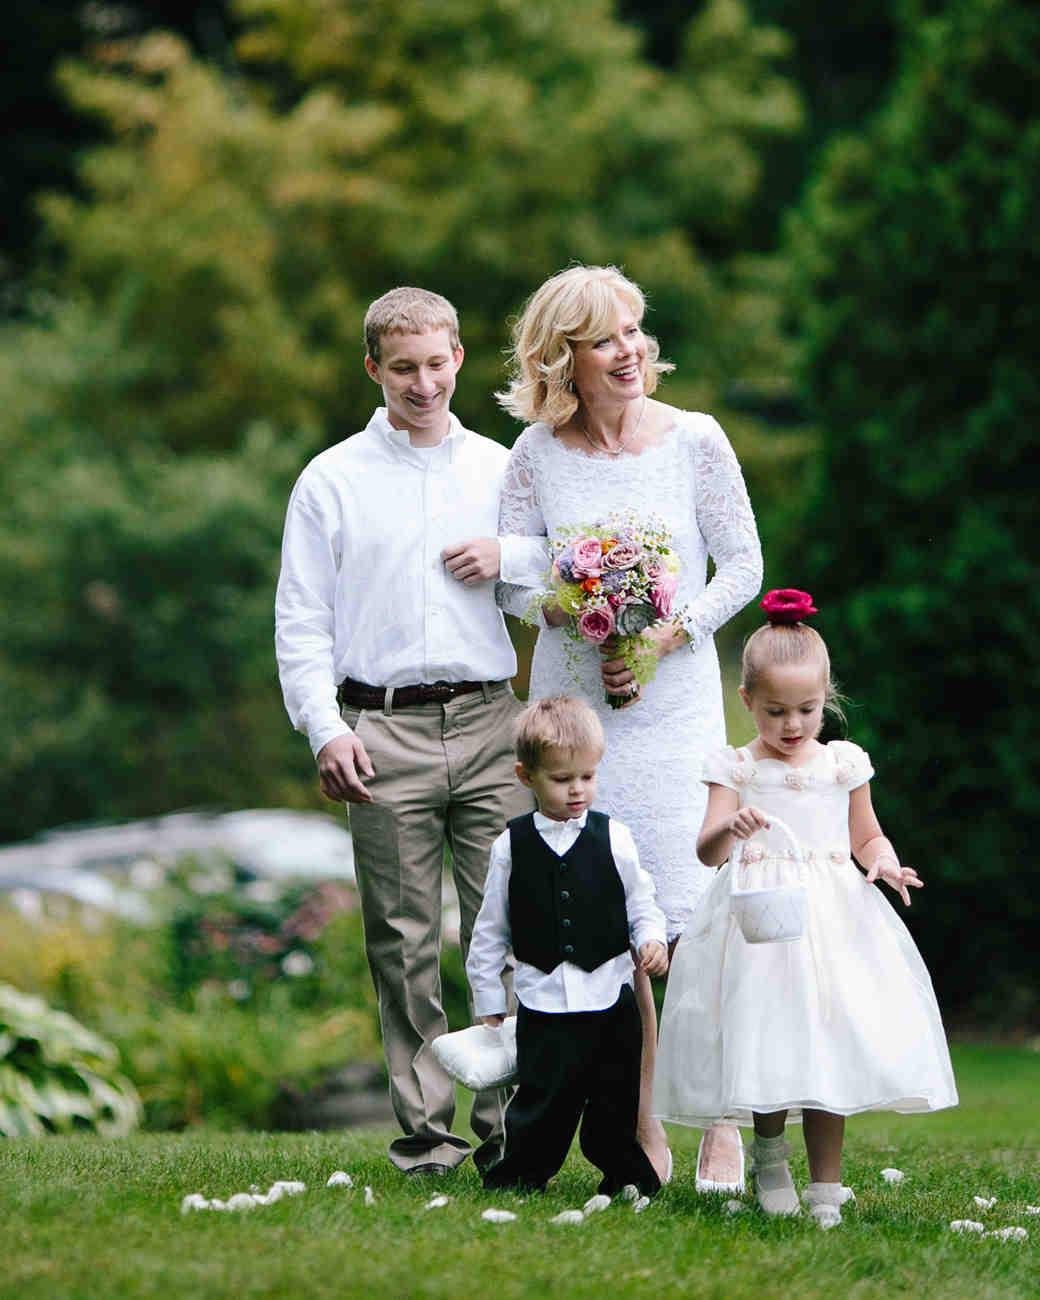 sandy-dwight-wedding-kids-0514.jpg